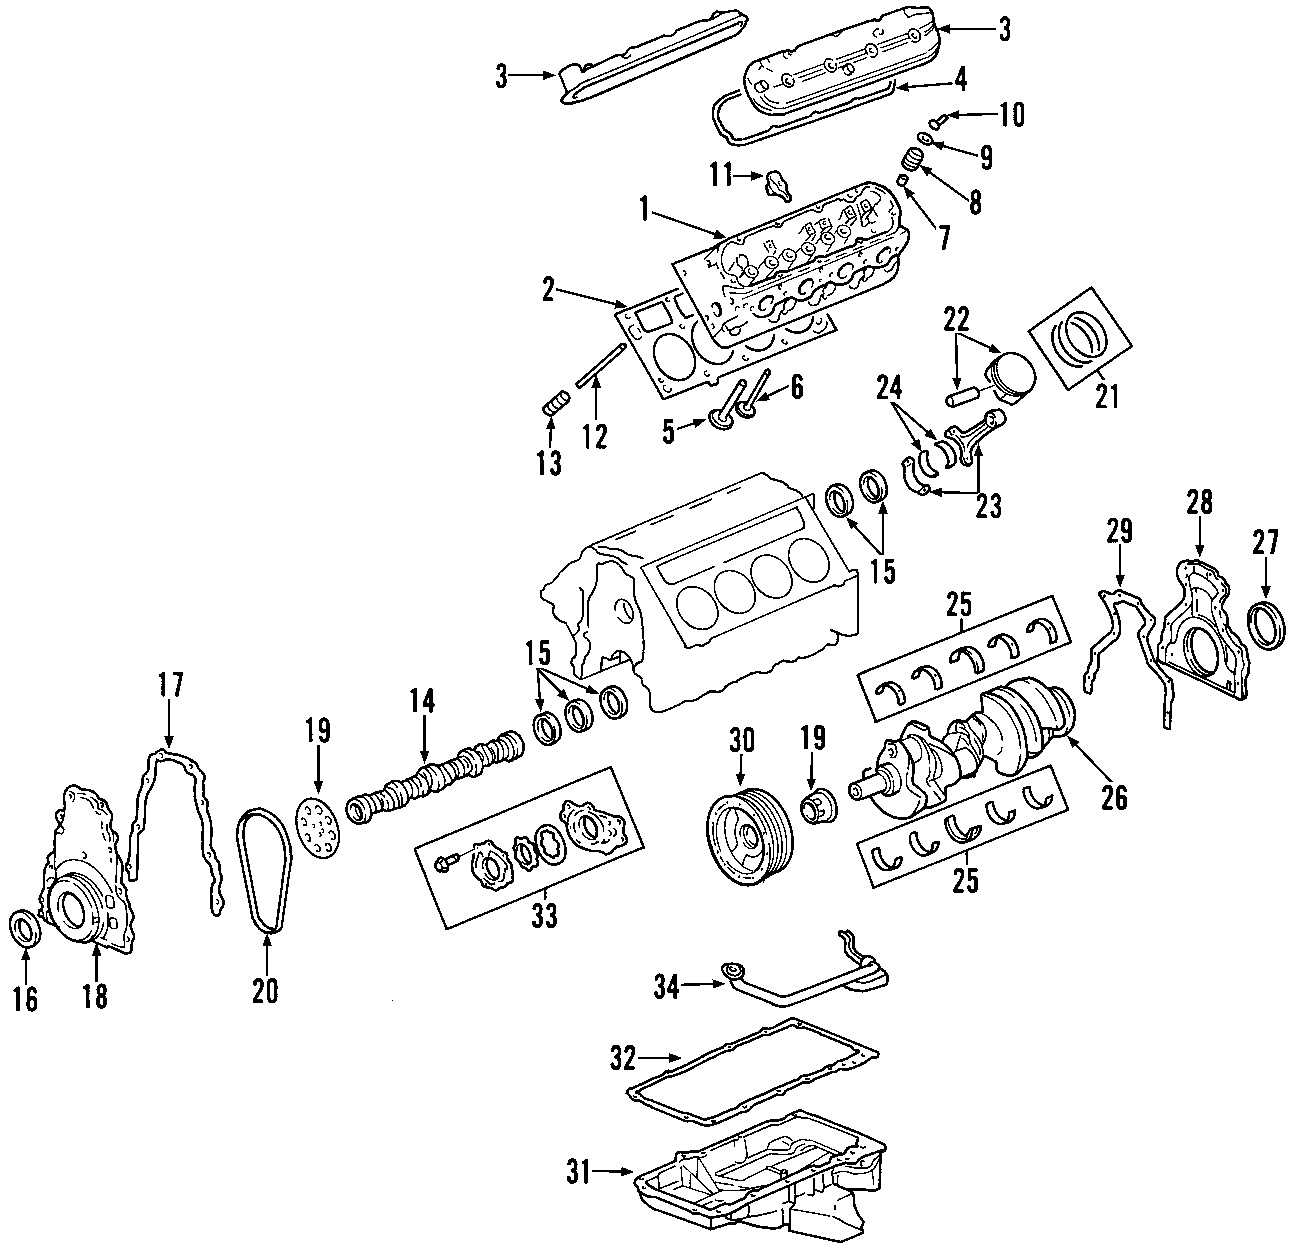 Chevrolet Suburban Engine Oil Pump Pickup Tube